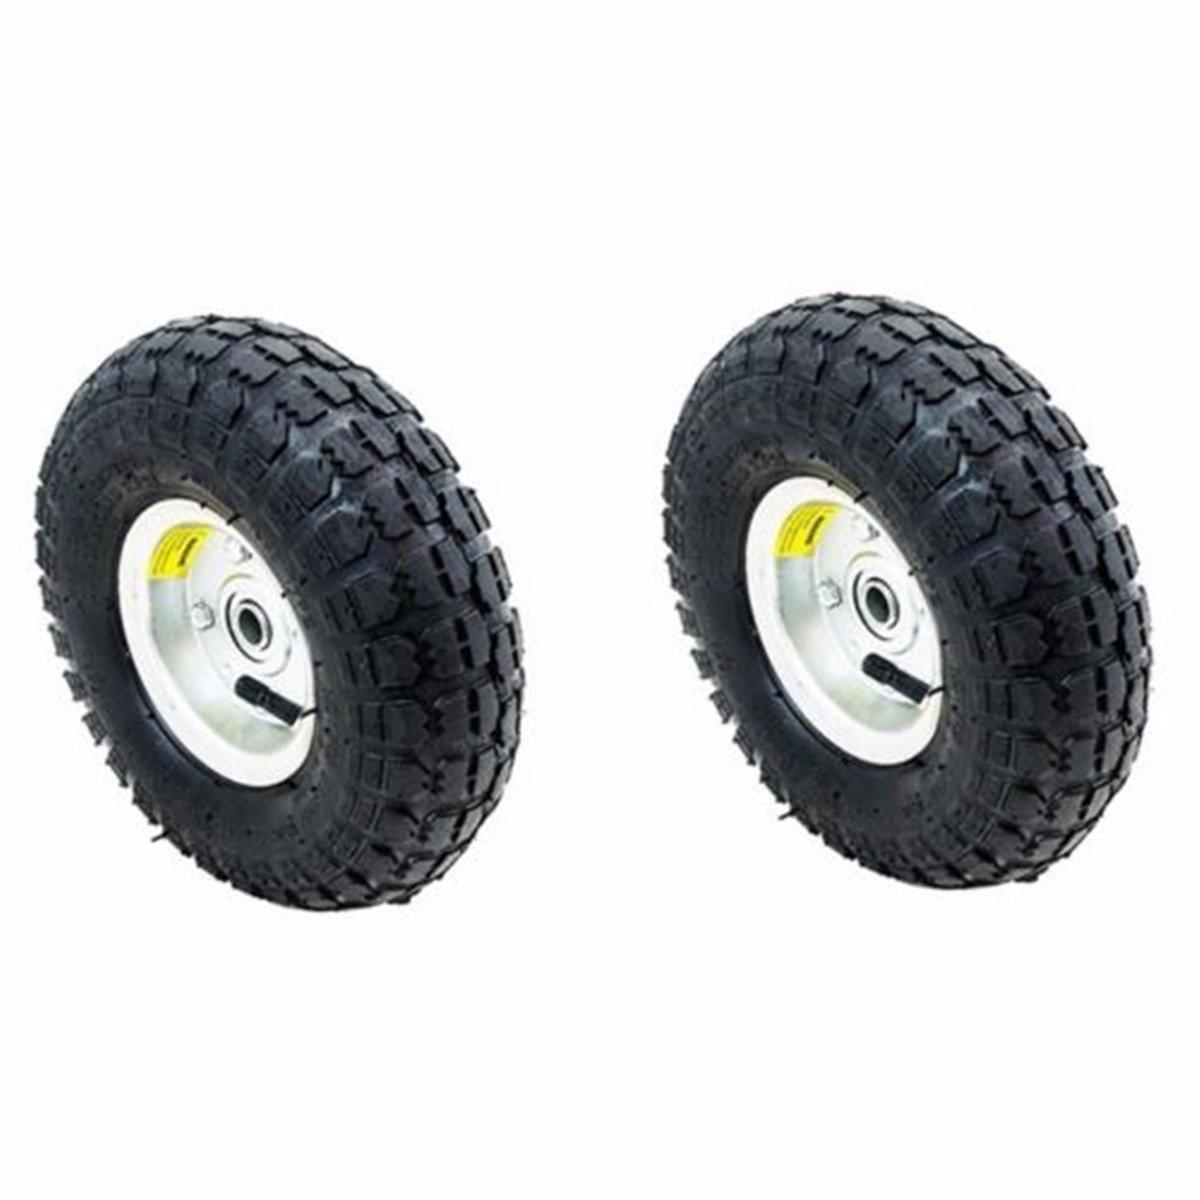 WShop 2pcs. Tires Set 10 in. Air Pneumatic Wheel Tires Handtruck Garden Cart Wagon Dump #122